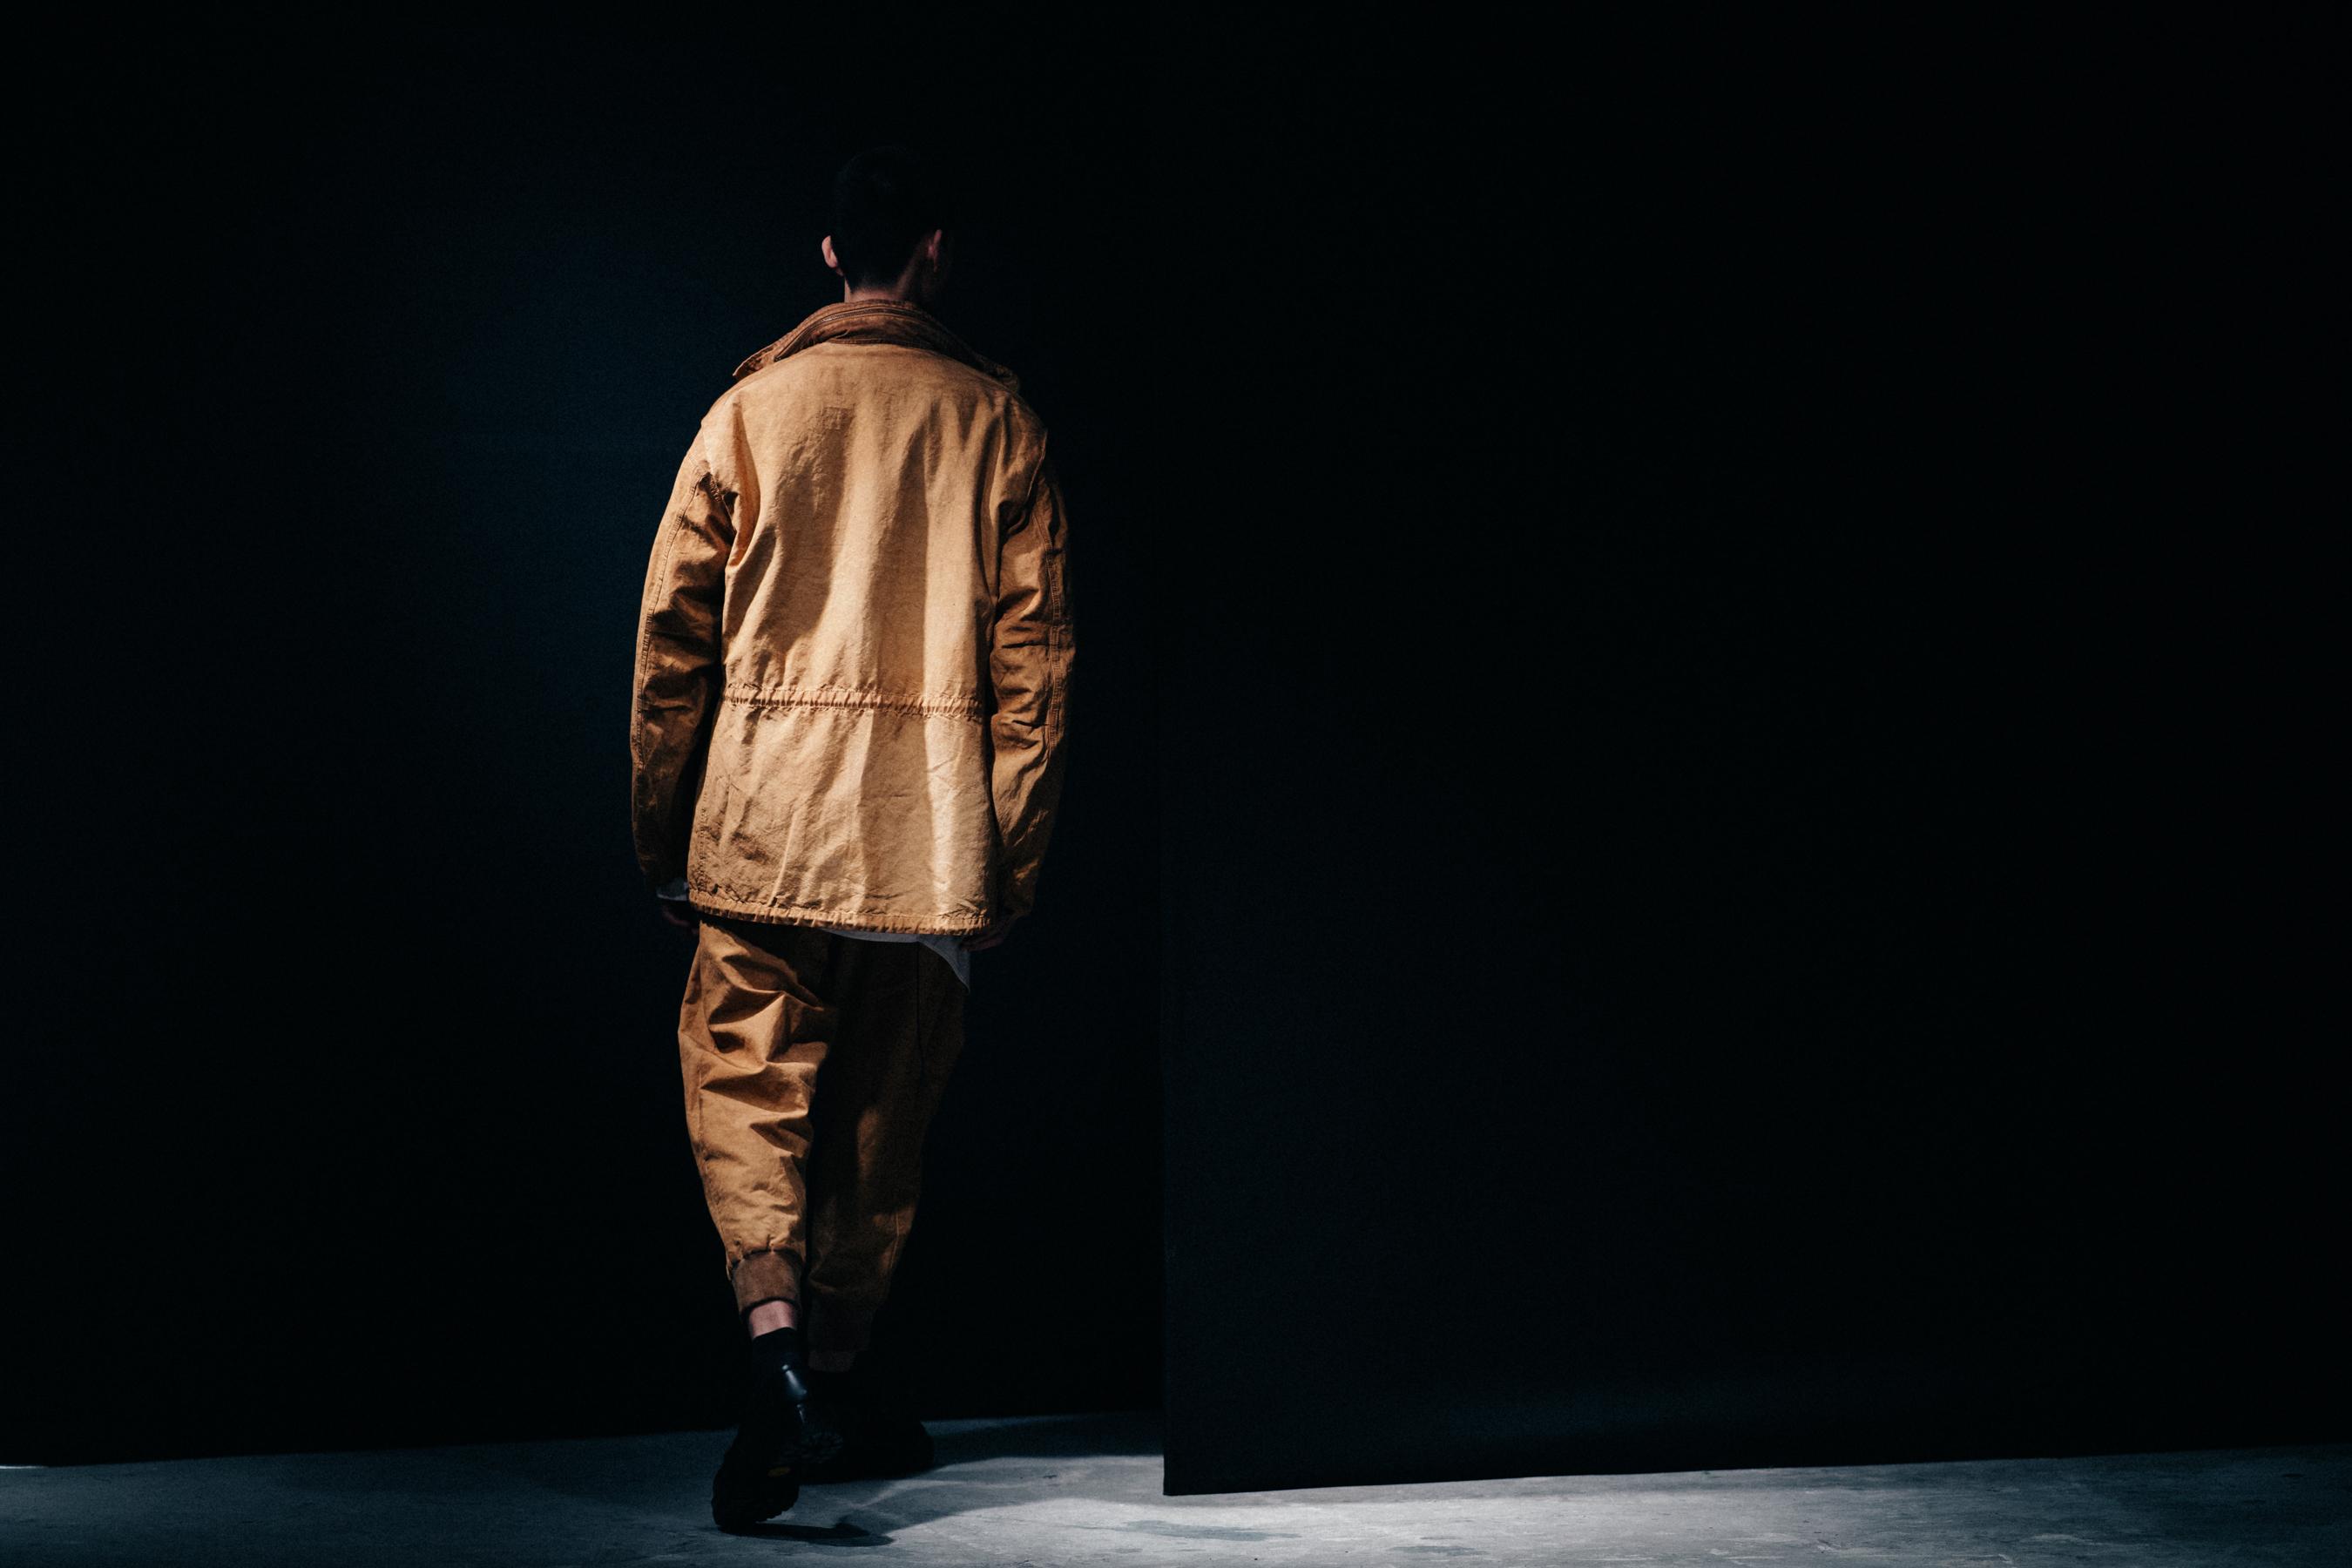 Le-21eme-Adam-Katz-Sinding-Backstage-Cornerstone-Homme-Shanghai-Fashion-Week-China-Fall-Winter-2017-2018_AKS3637